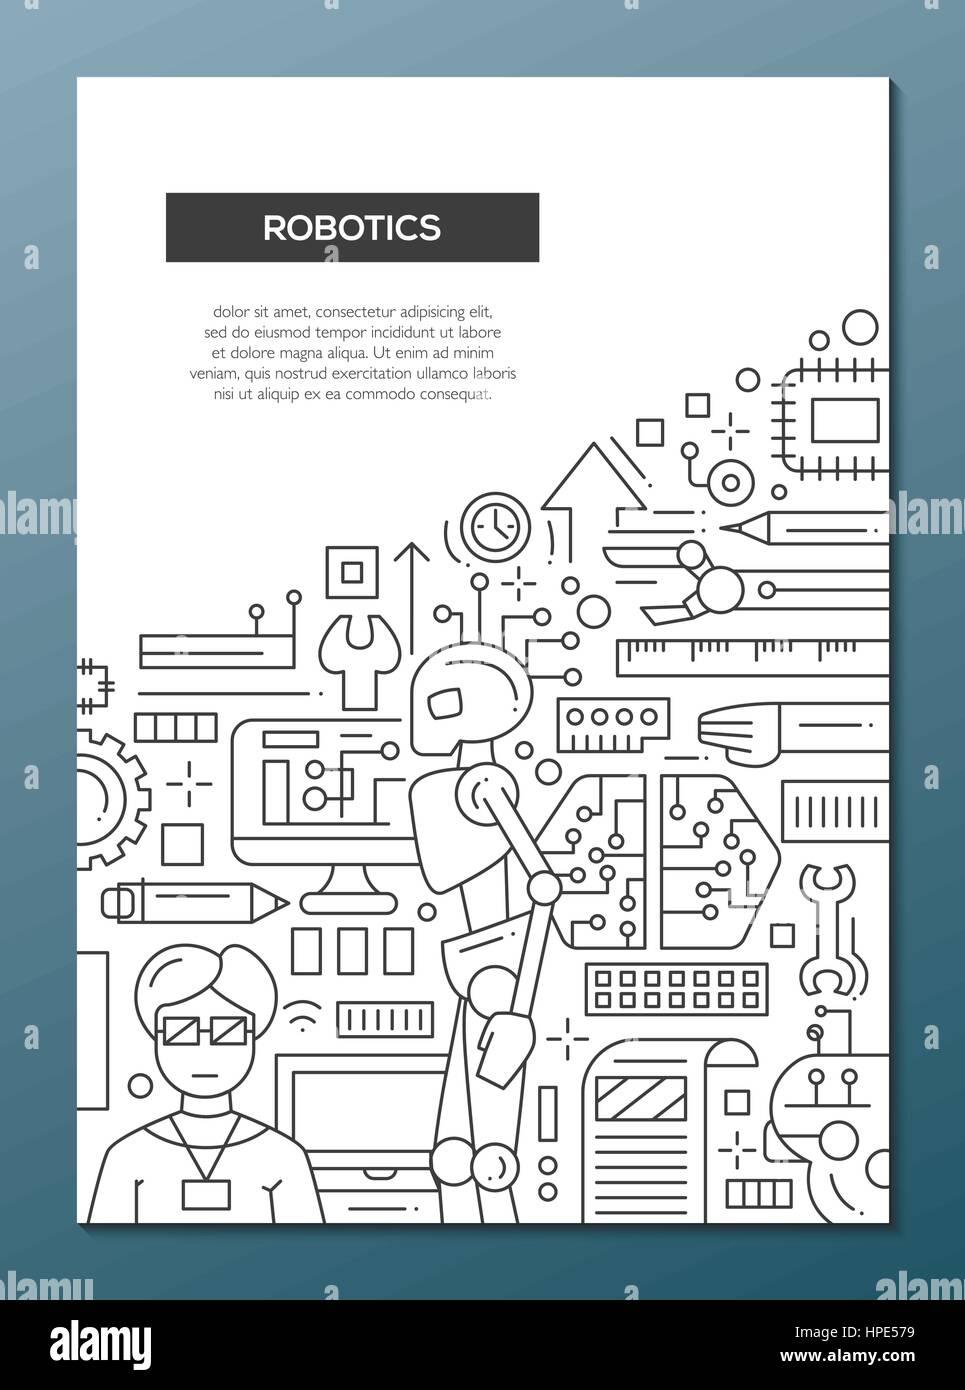 Robotics Line Design Brochure Poster Template A4 Stock Vector Art